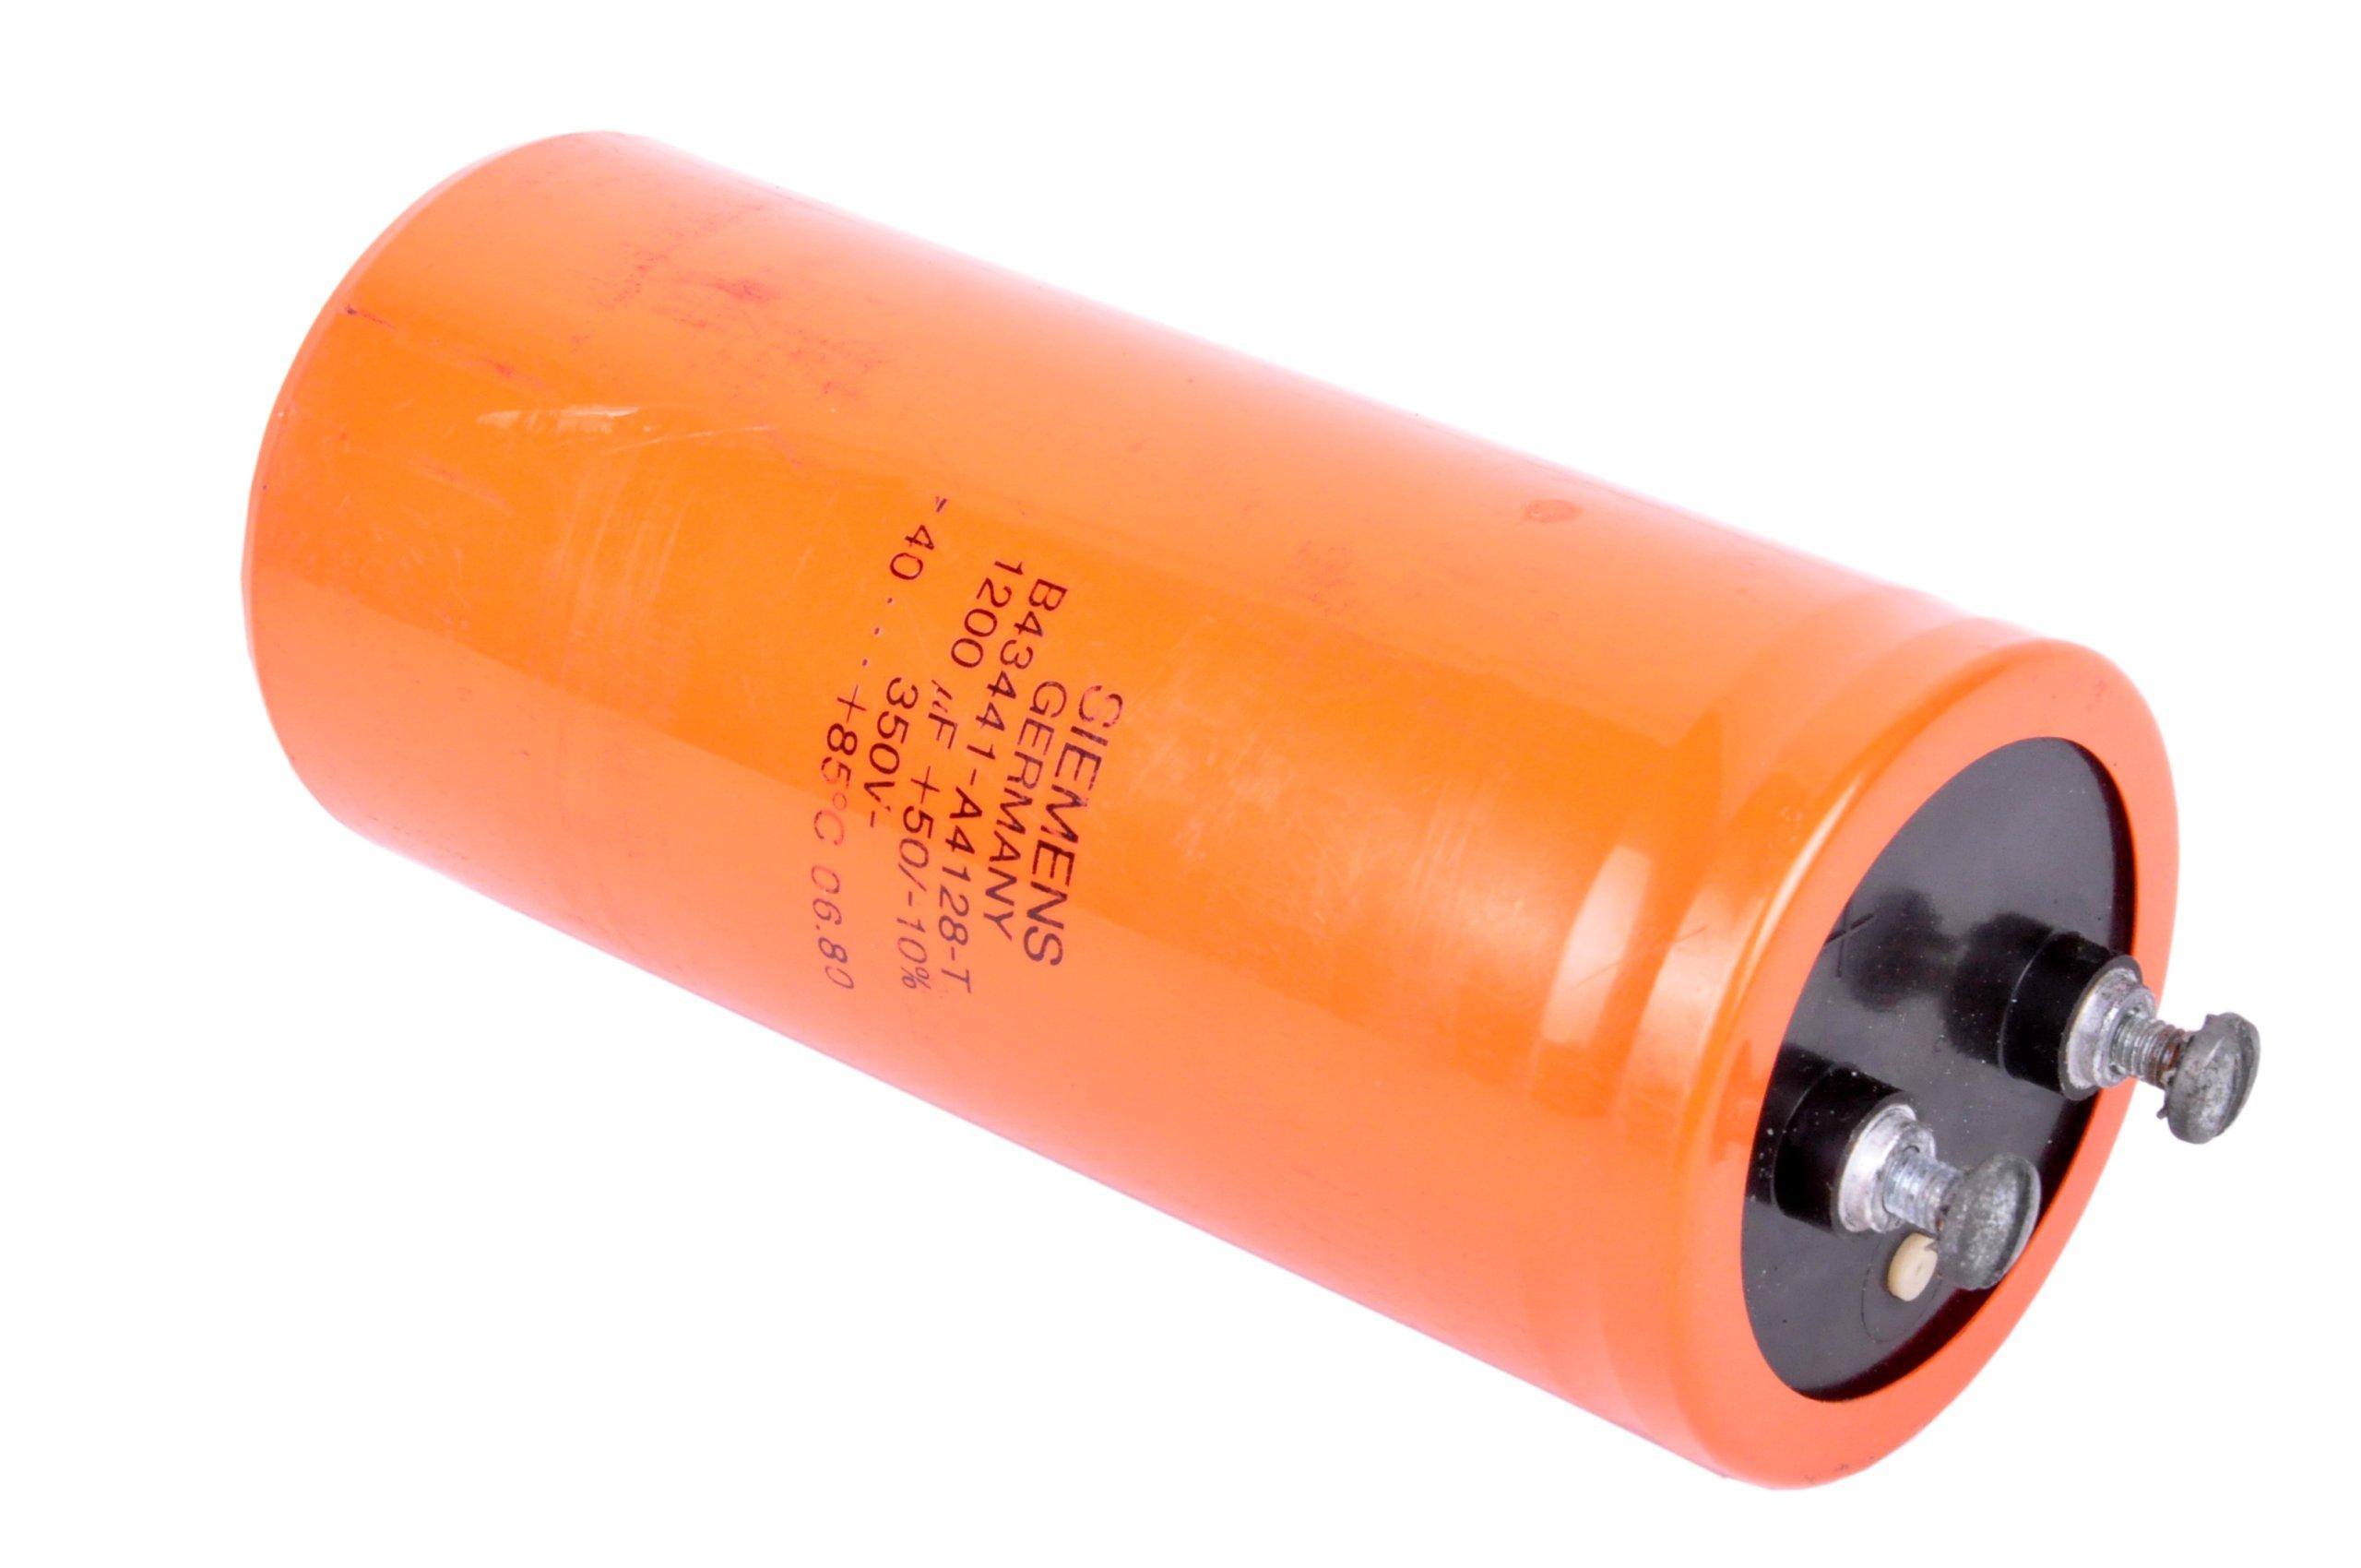 Siemens Capacitor 1200uf B43441-A4128-T 350VDC